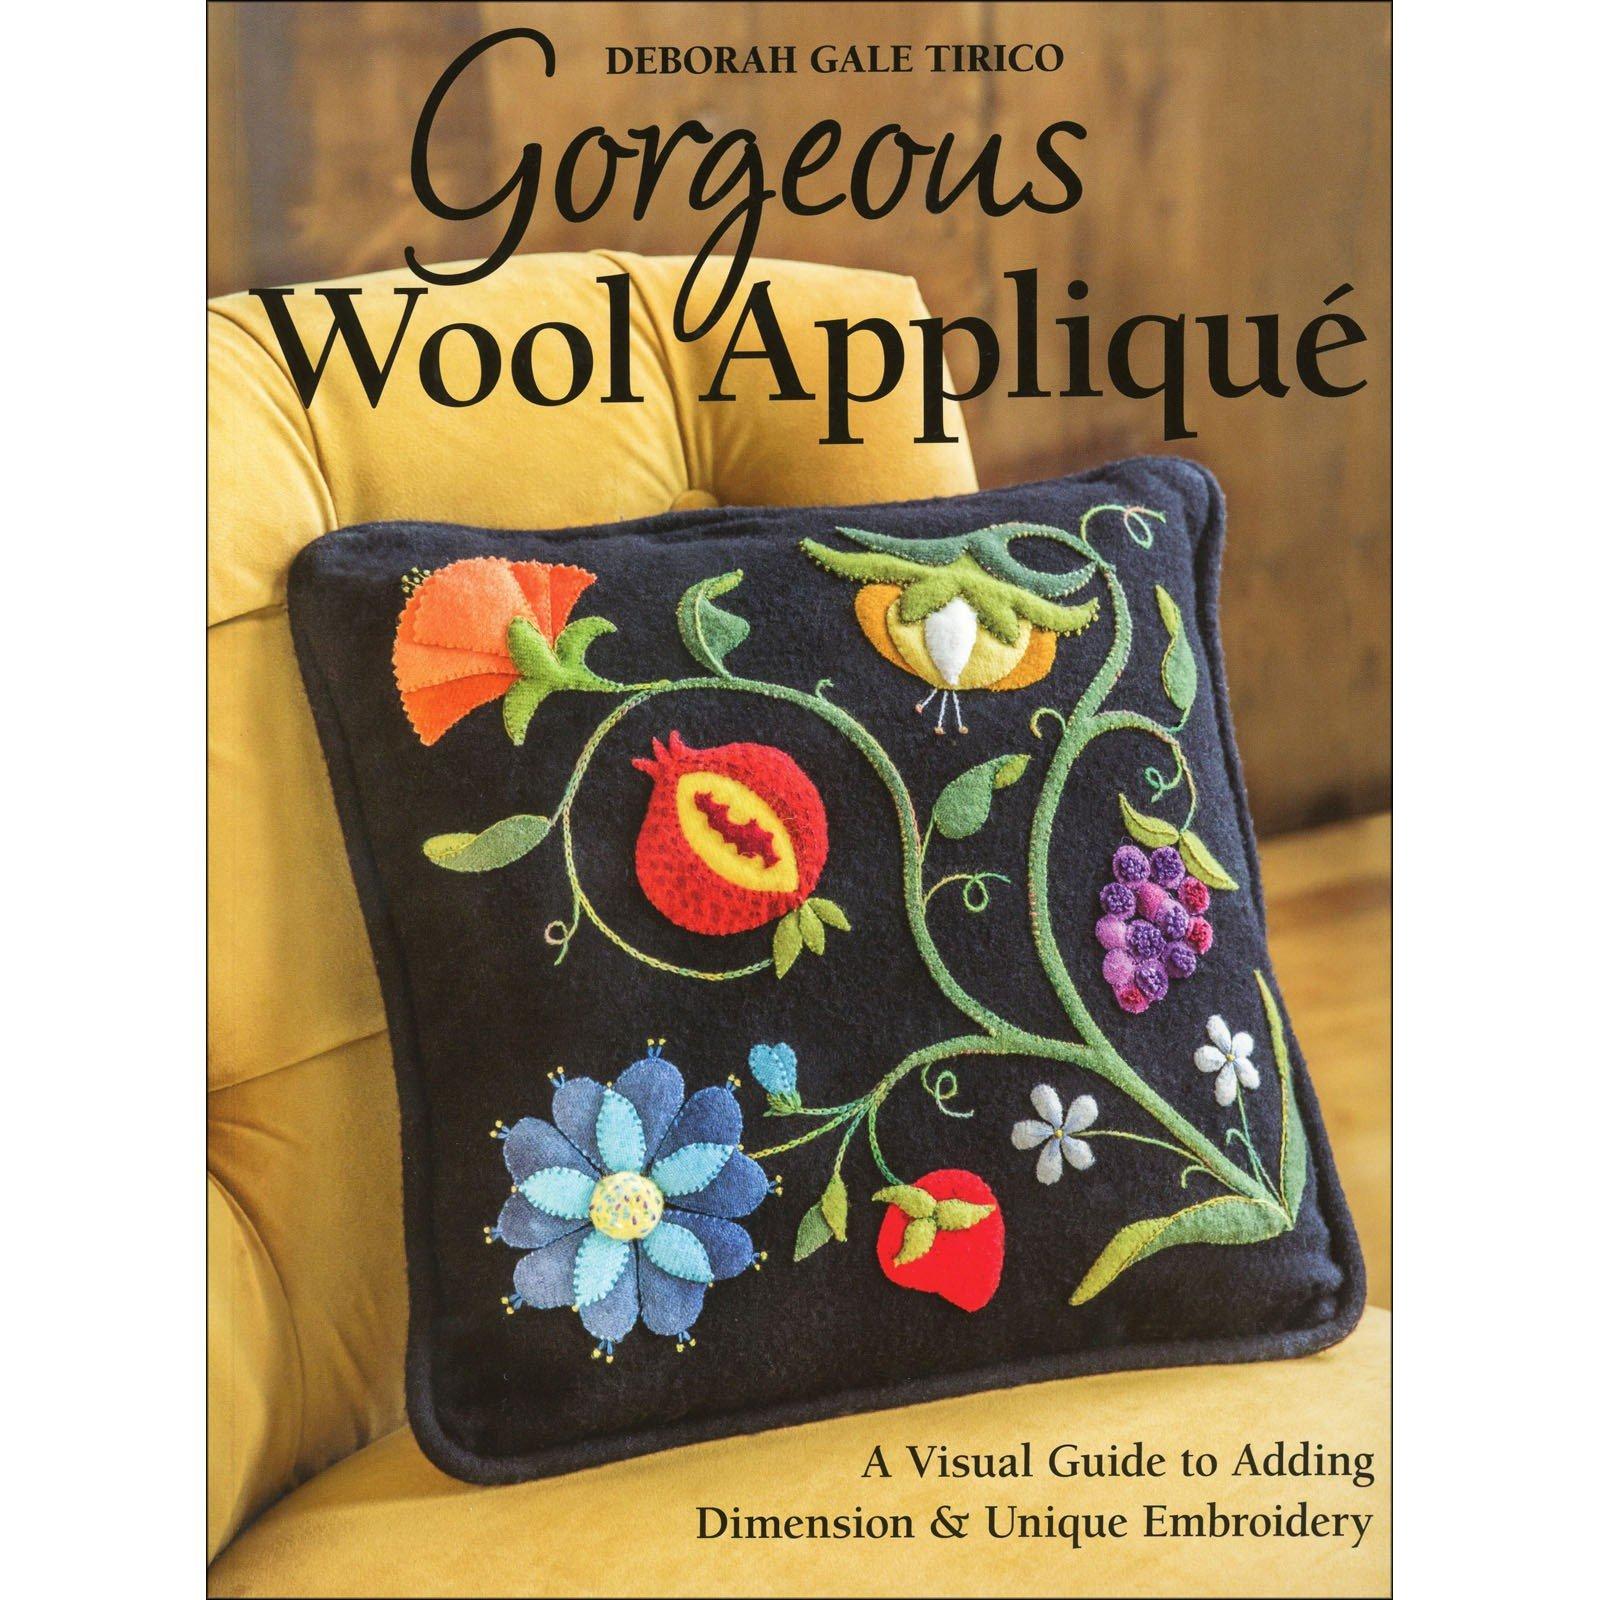 Book Gorgeous Wool Applique by  Deborah Gale Tirico CTP11146